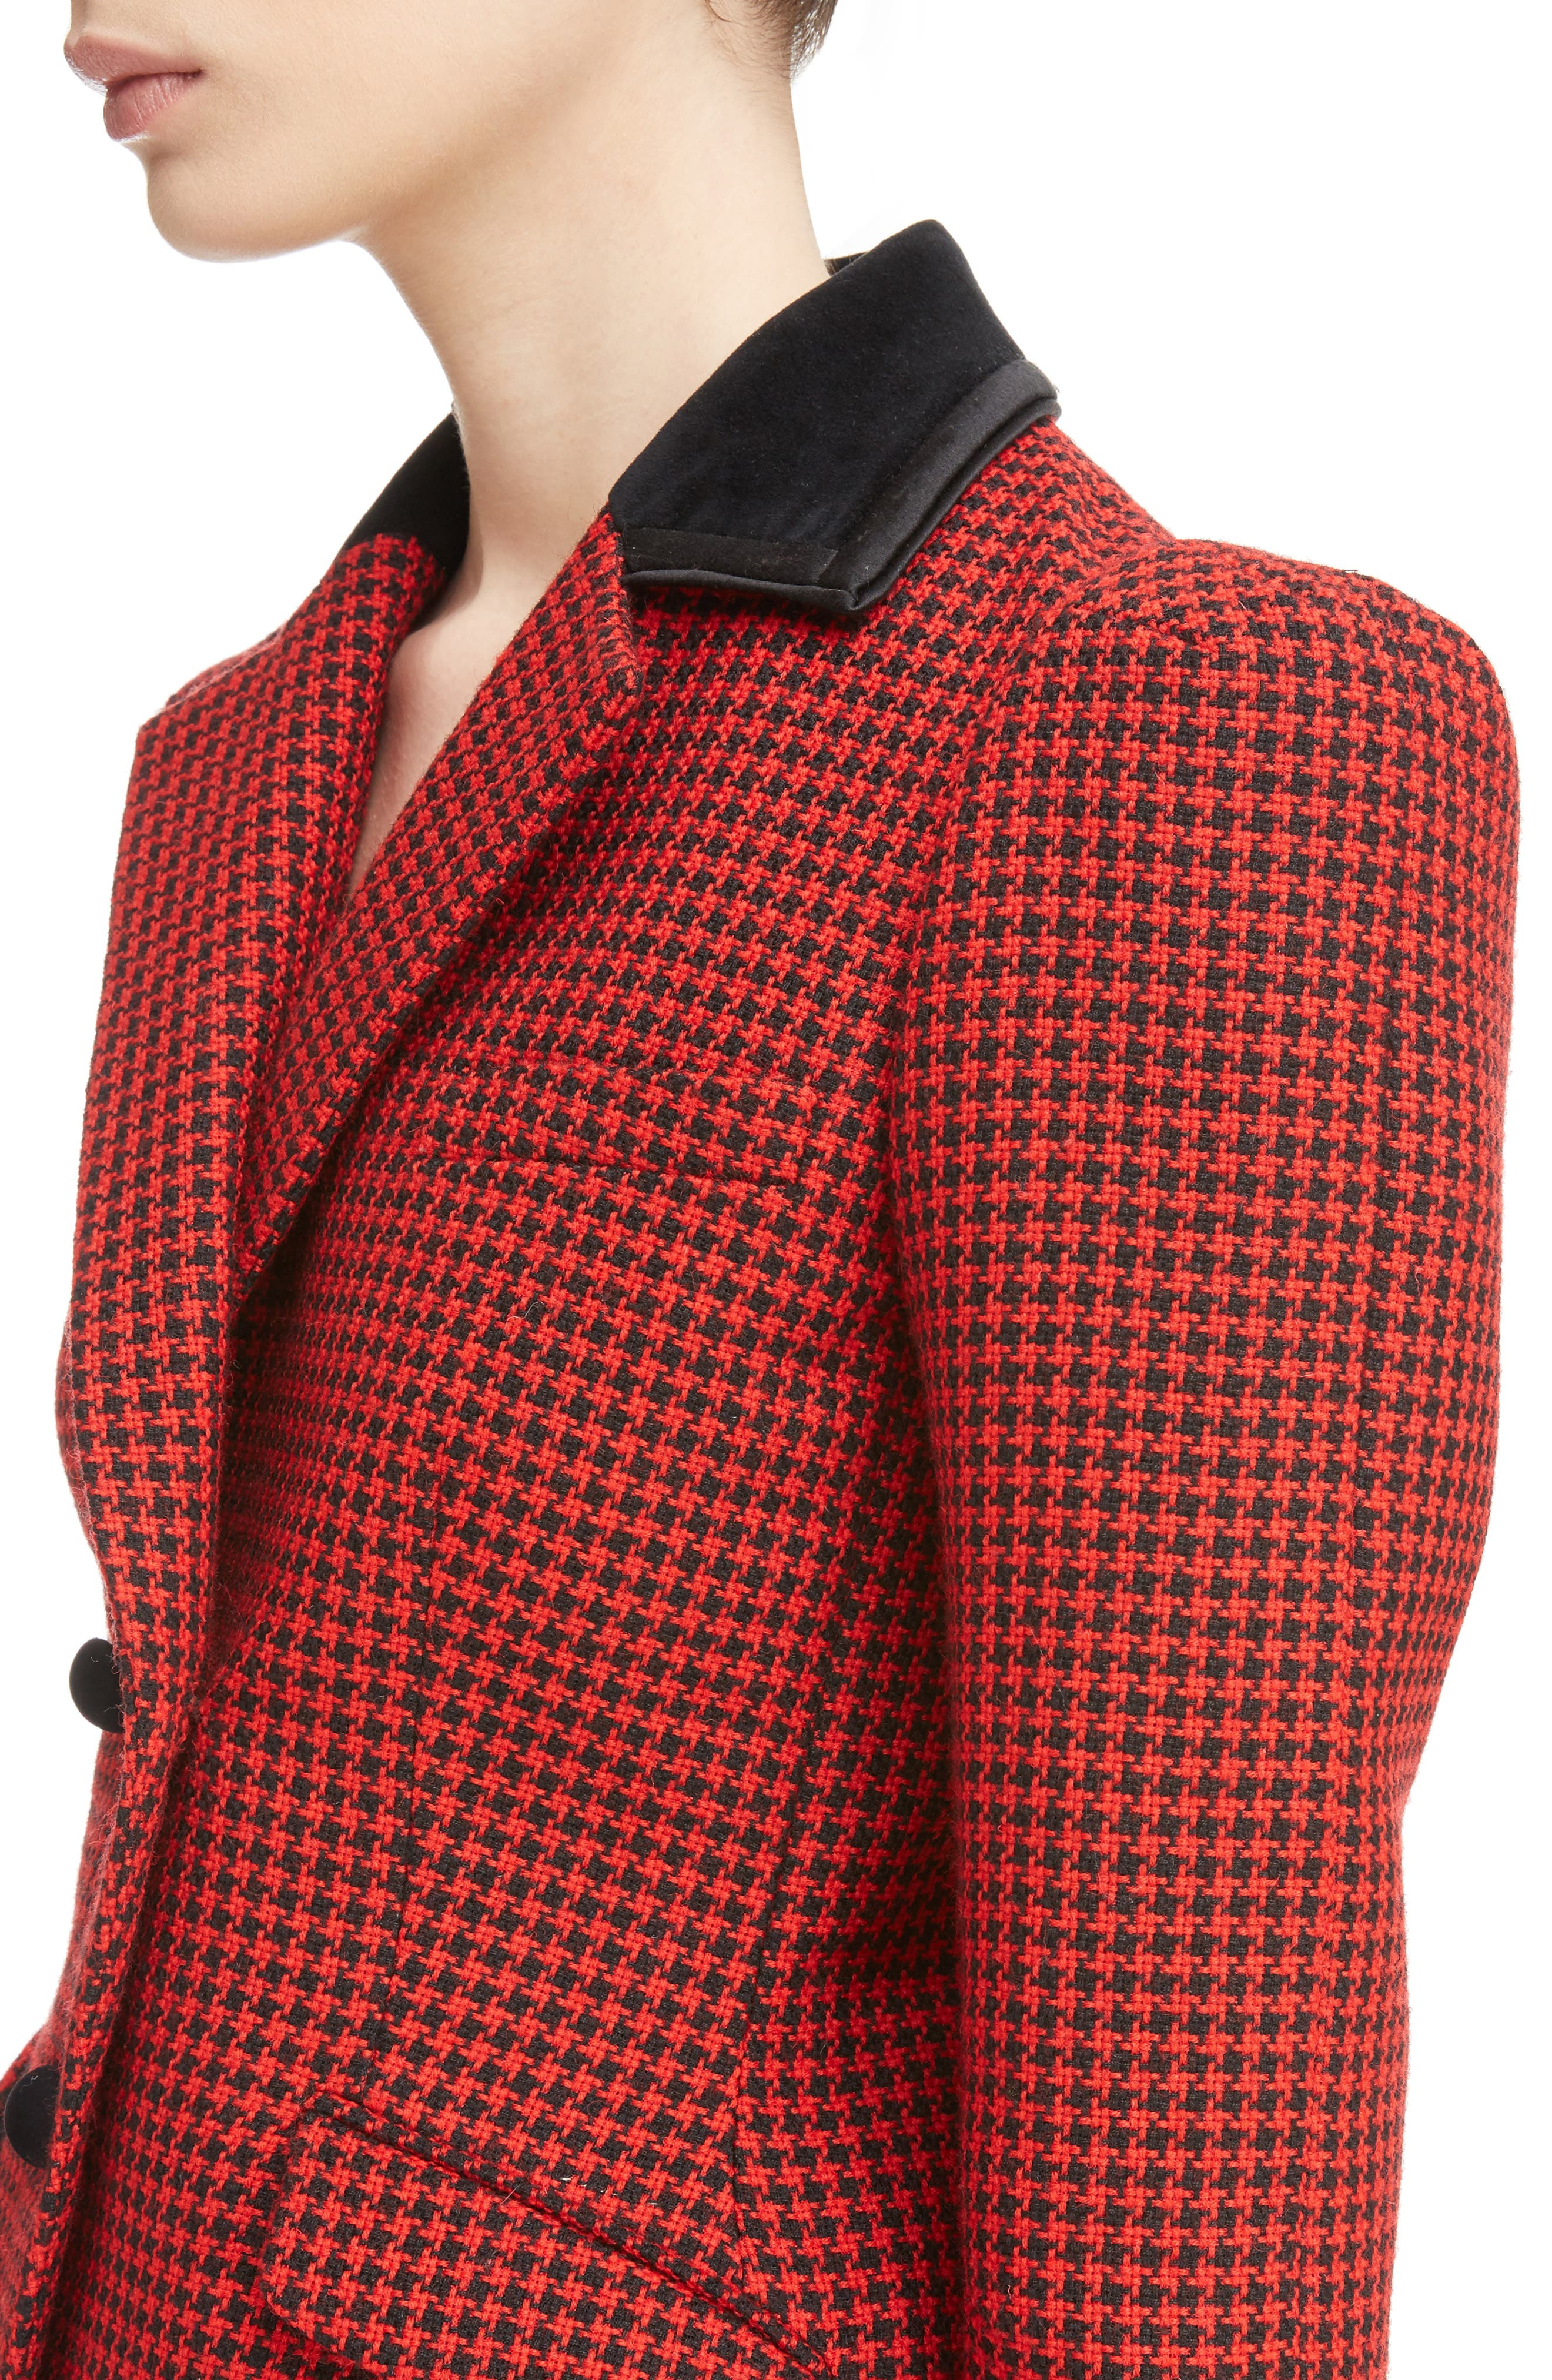 Paladini Houndstooth Wool Jacket,                             Alternate thumbnail 4, color,                             Scarlet/ Black